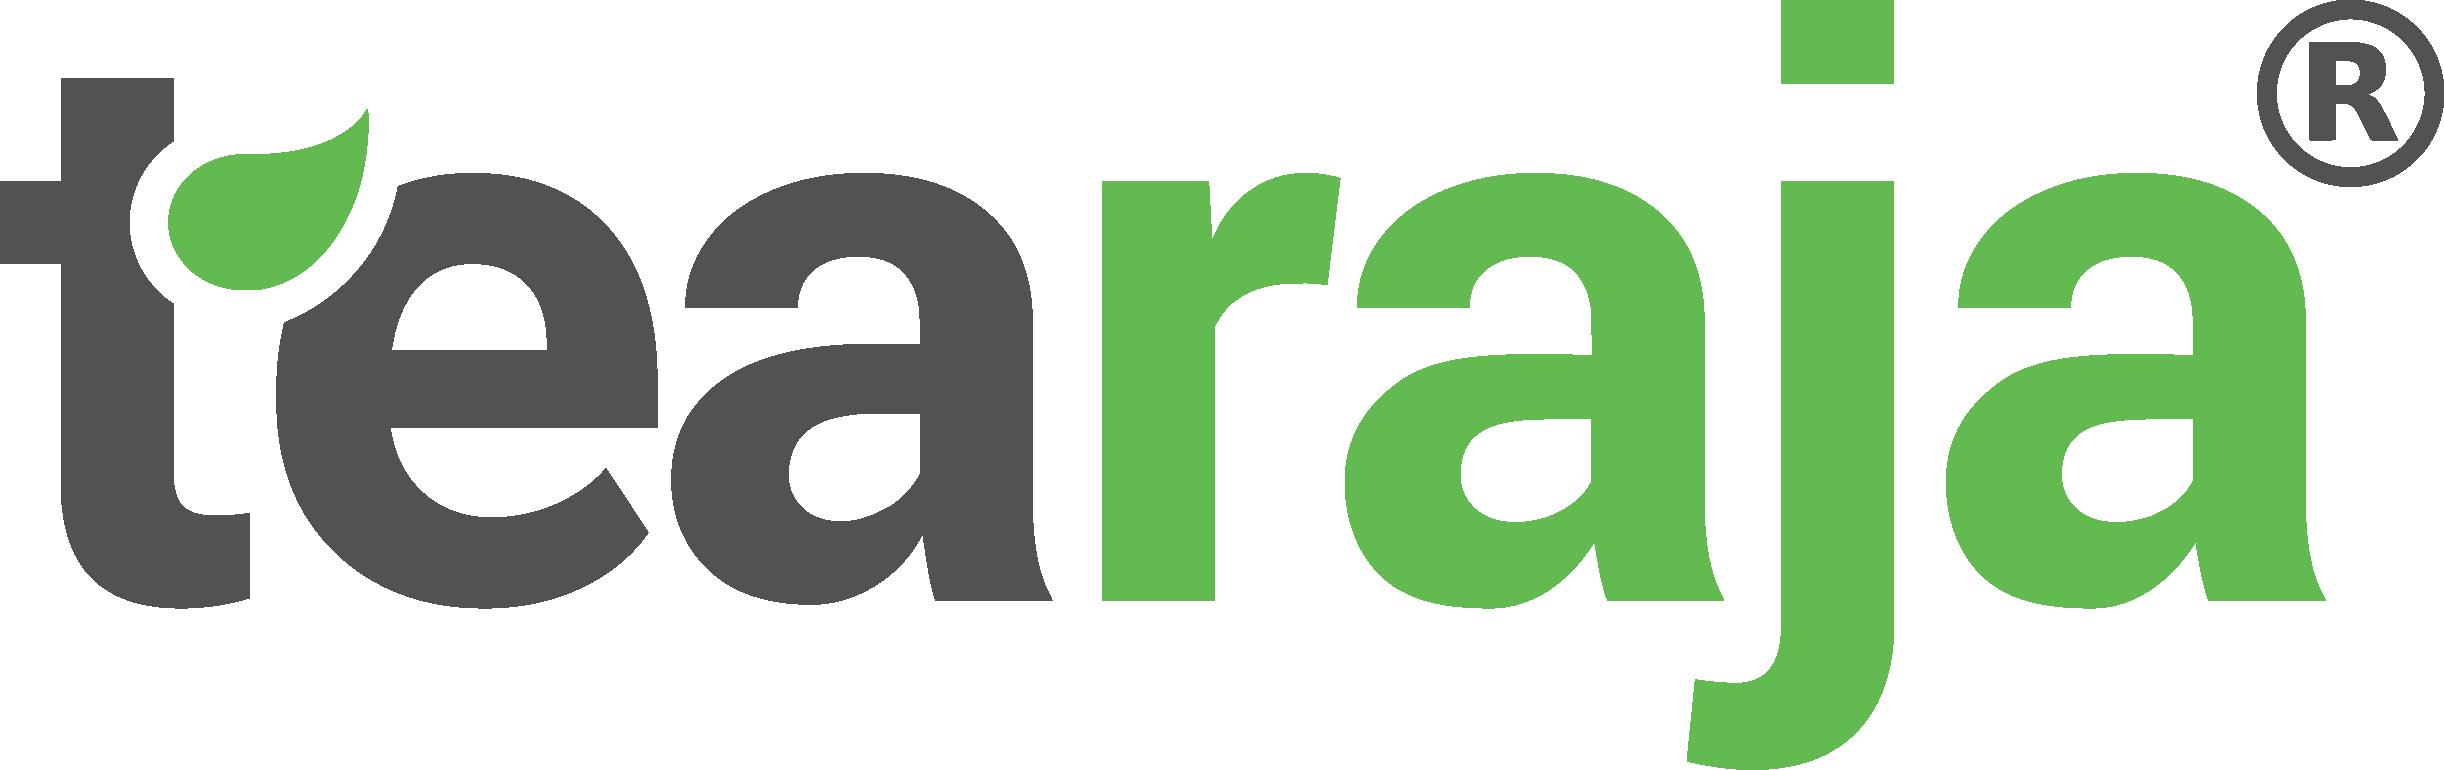 The D2C Summit Sponsor - Tearaja